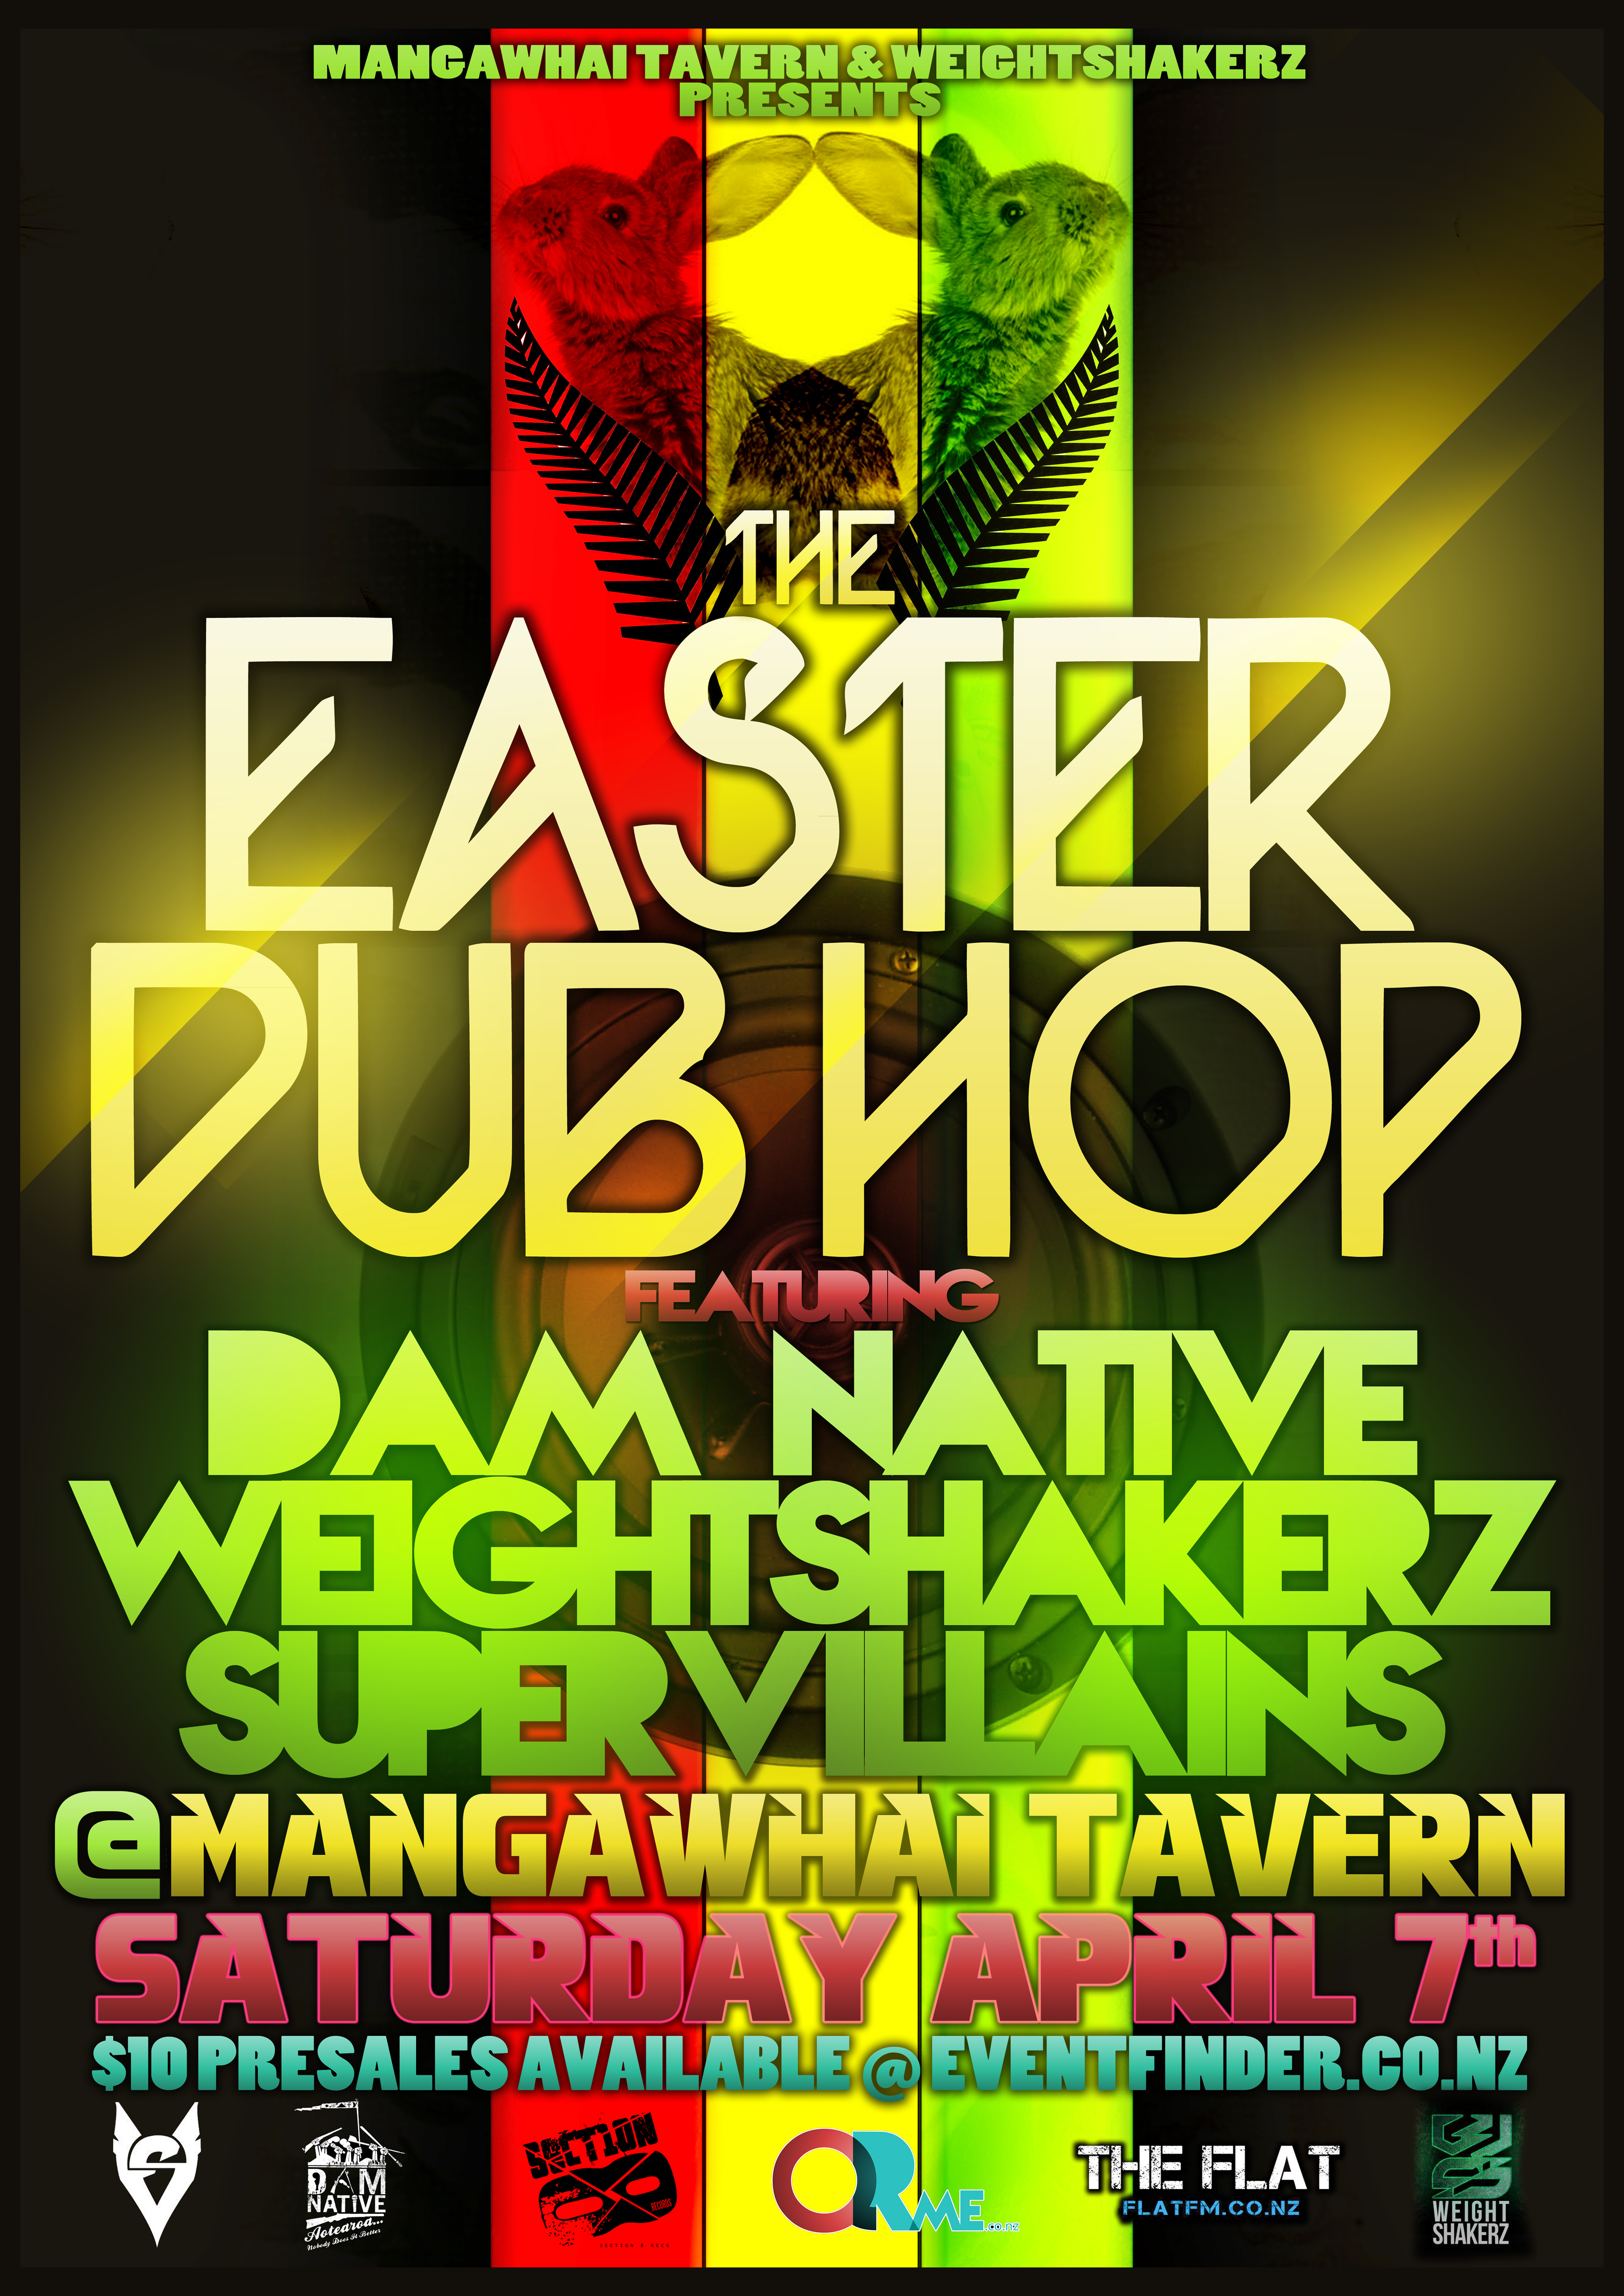 Easter Dub Hop